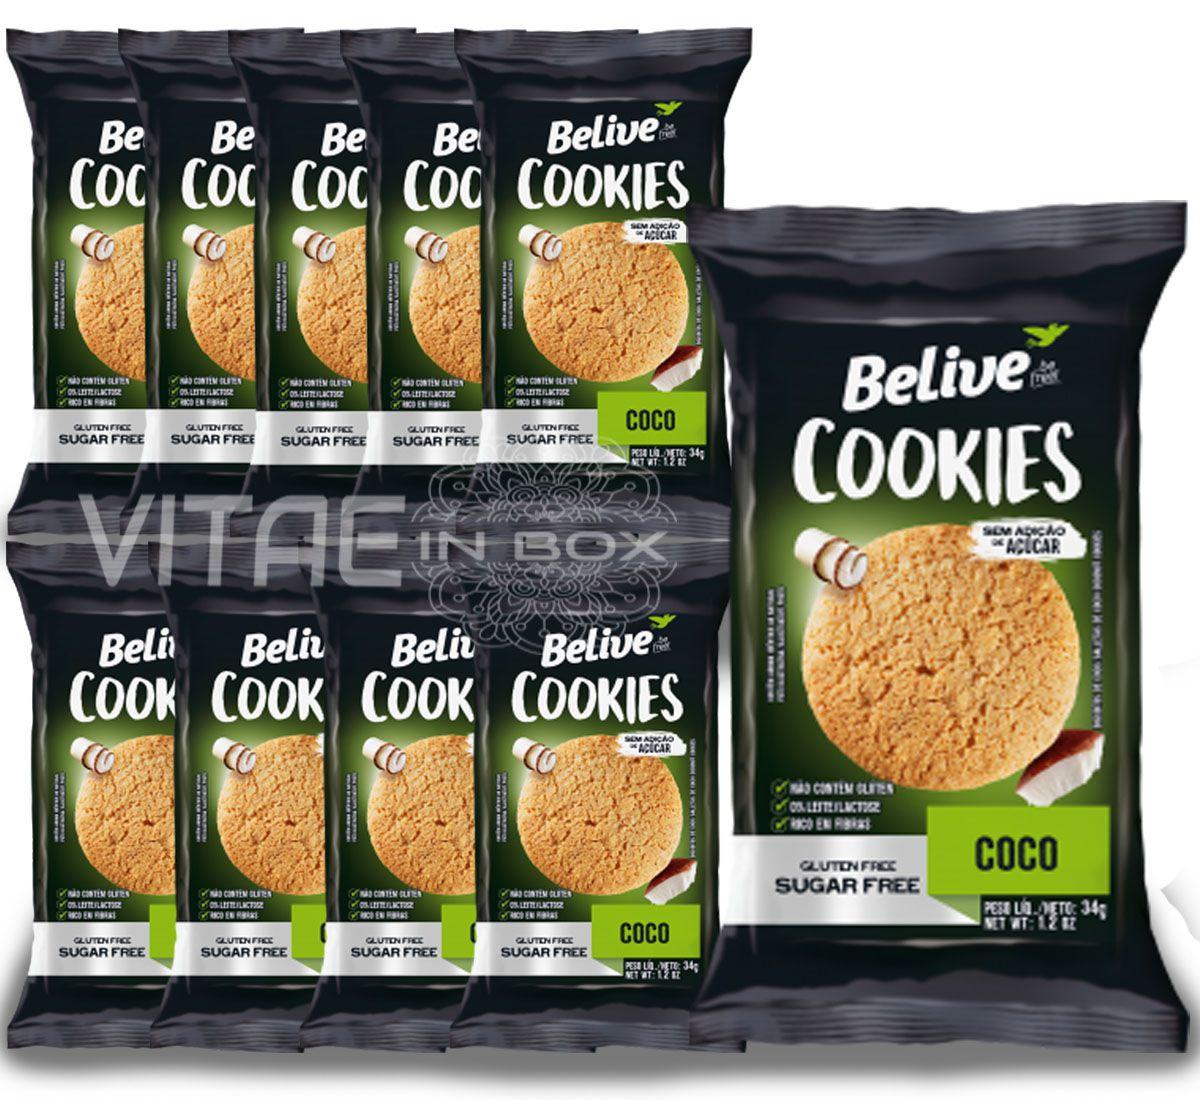 Cookie Coco Zero Açúcar Sem Glúten Sem Lactose 10x34g - Belive